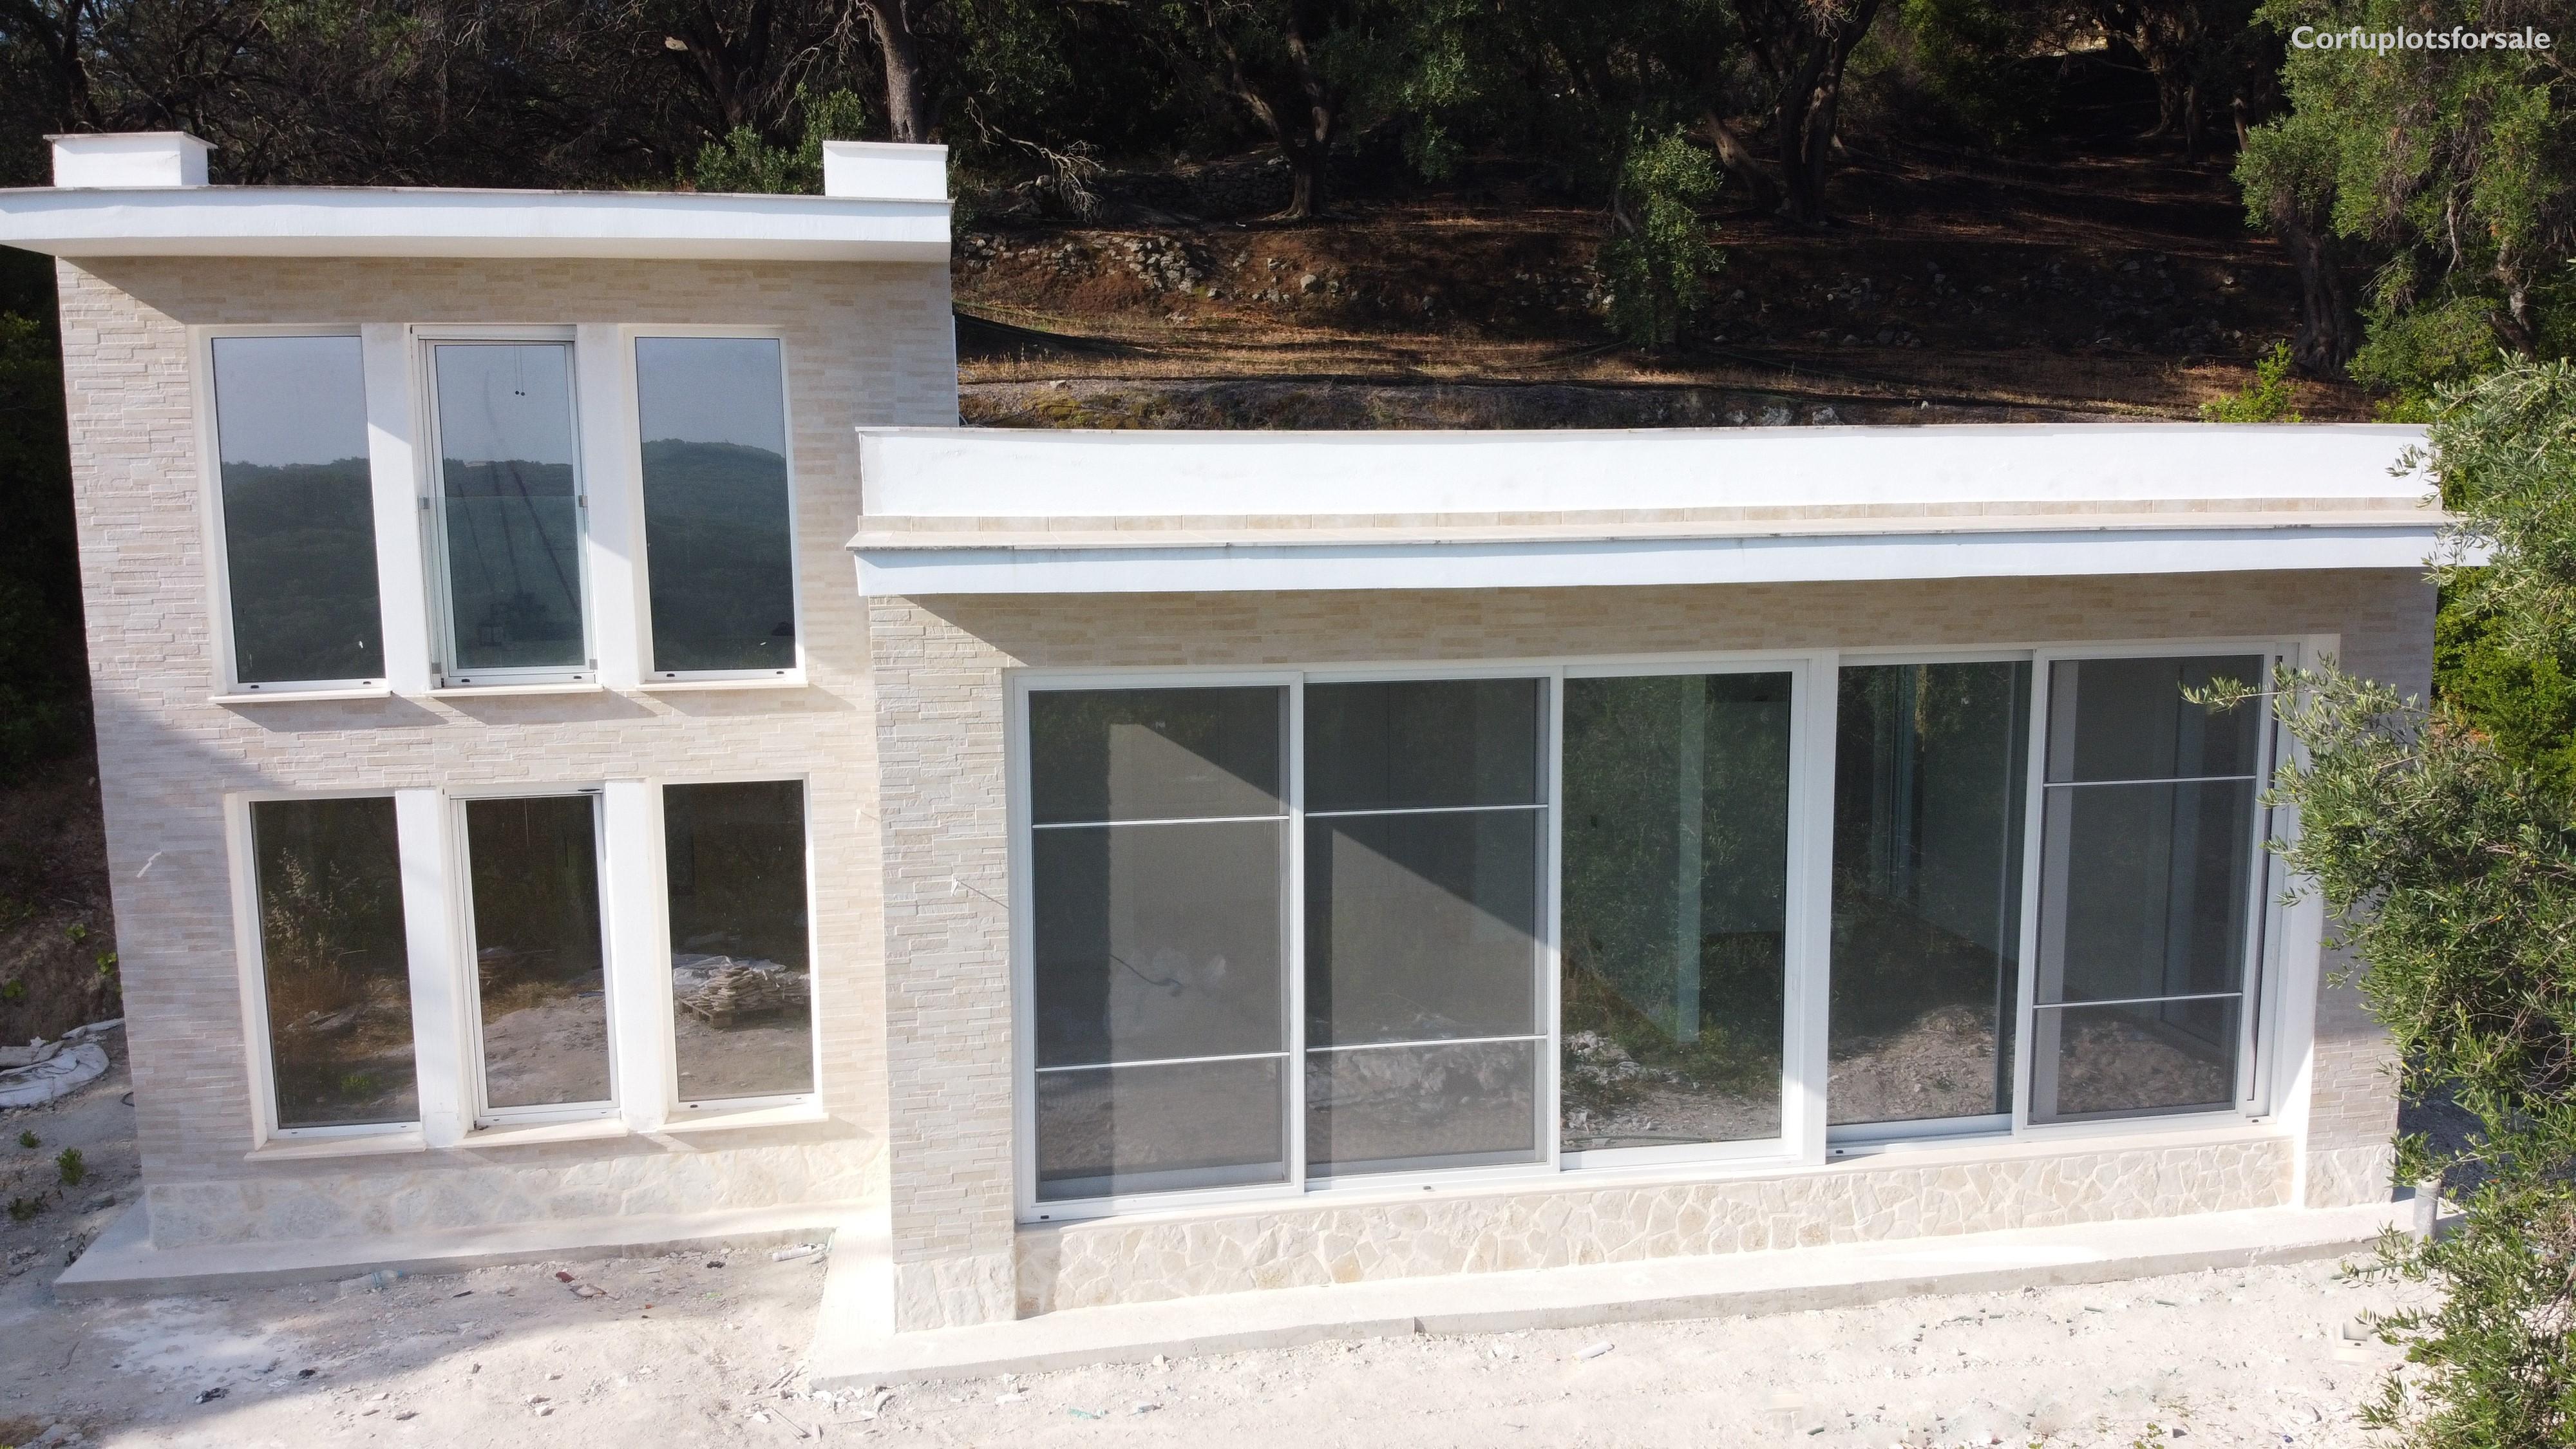 110 sq.m modern design villa under construction